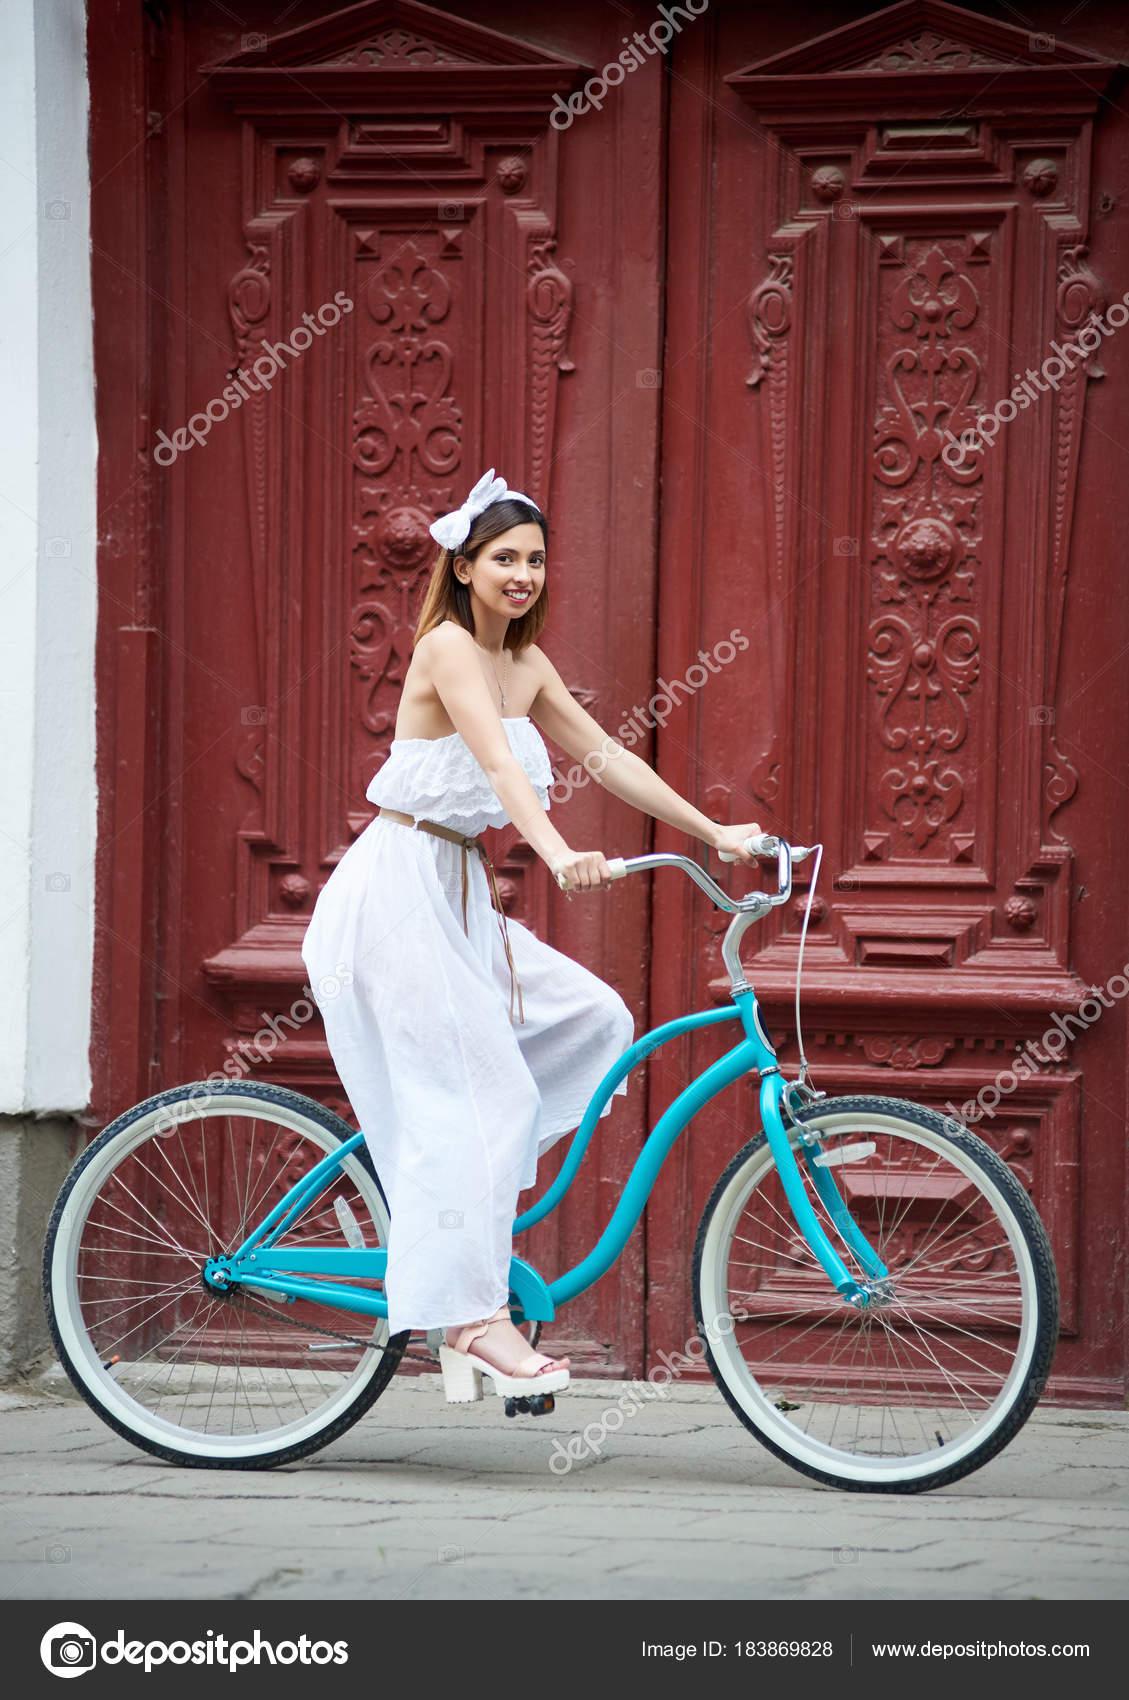 a3efda07d8e depositphotos 183869828-stock-photo-woman-long-light-dress-sitting.jpg